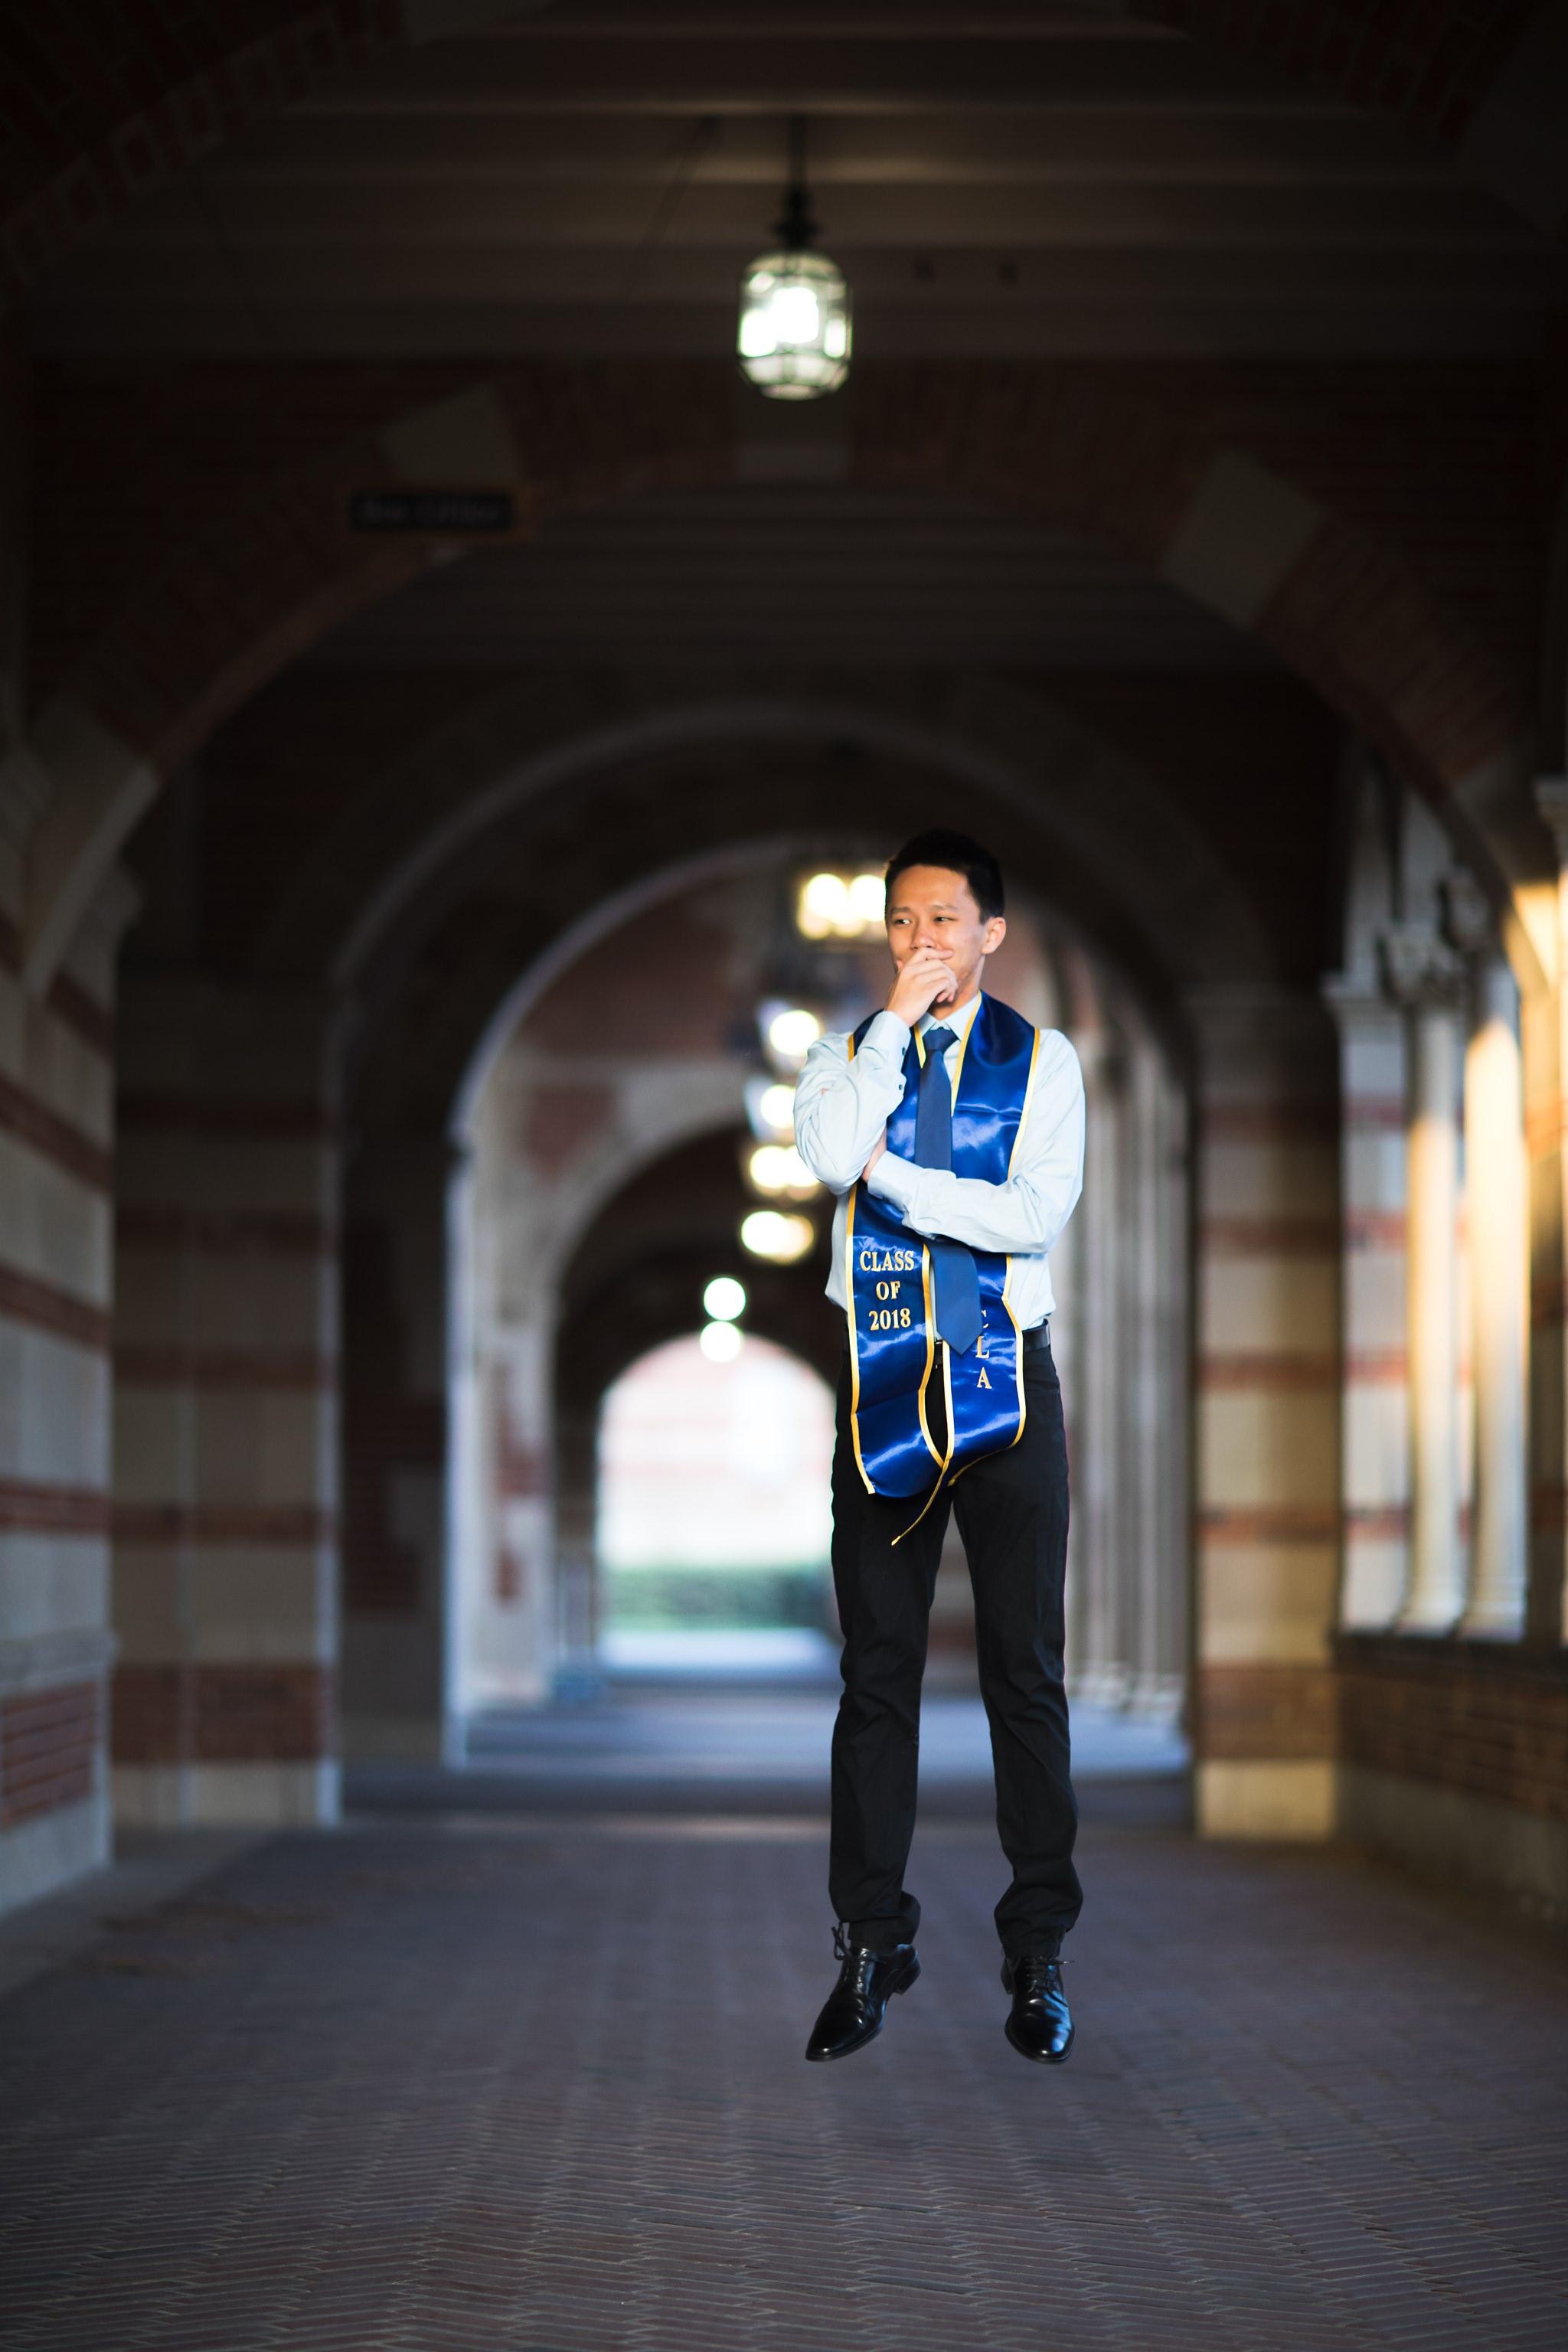 los-angeles-ucla-senior-graduation-portraits-royce-hall-arches-jumping